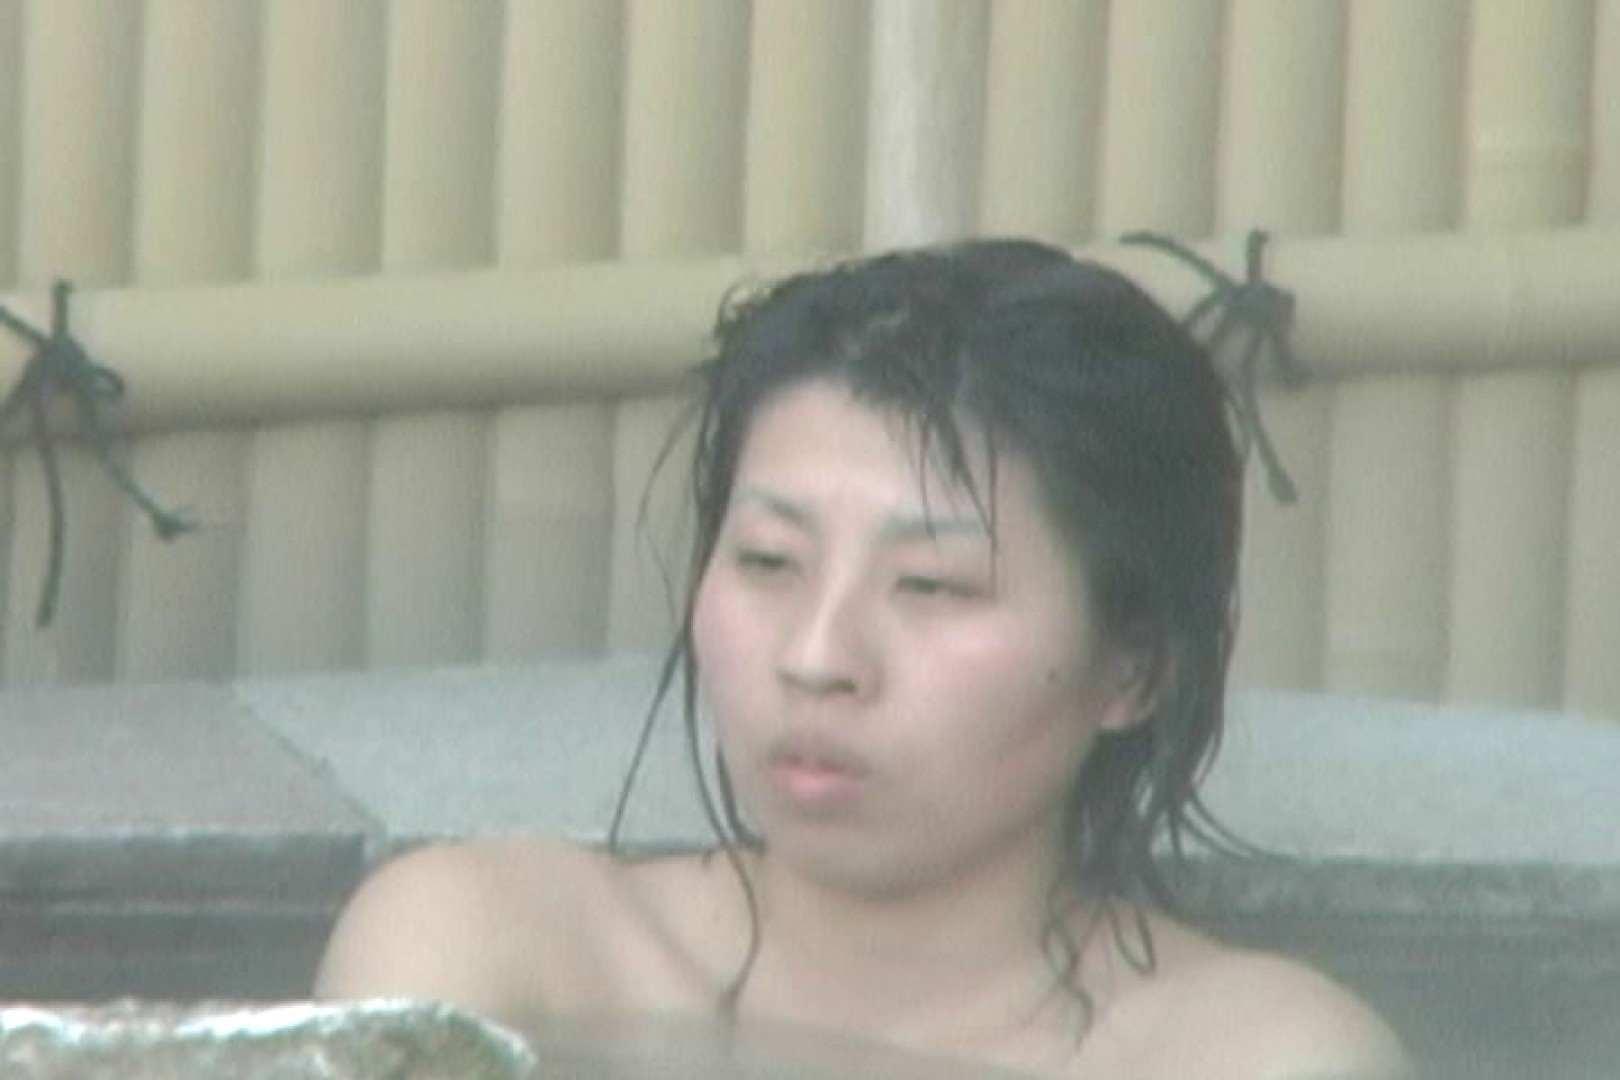 Aquaな露天風呂Vol.589 盗撮シリーズ | 露天風呂編  113PIX 41